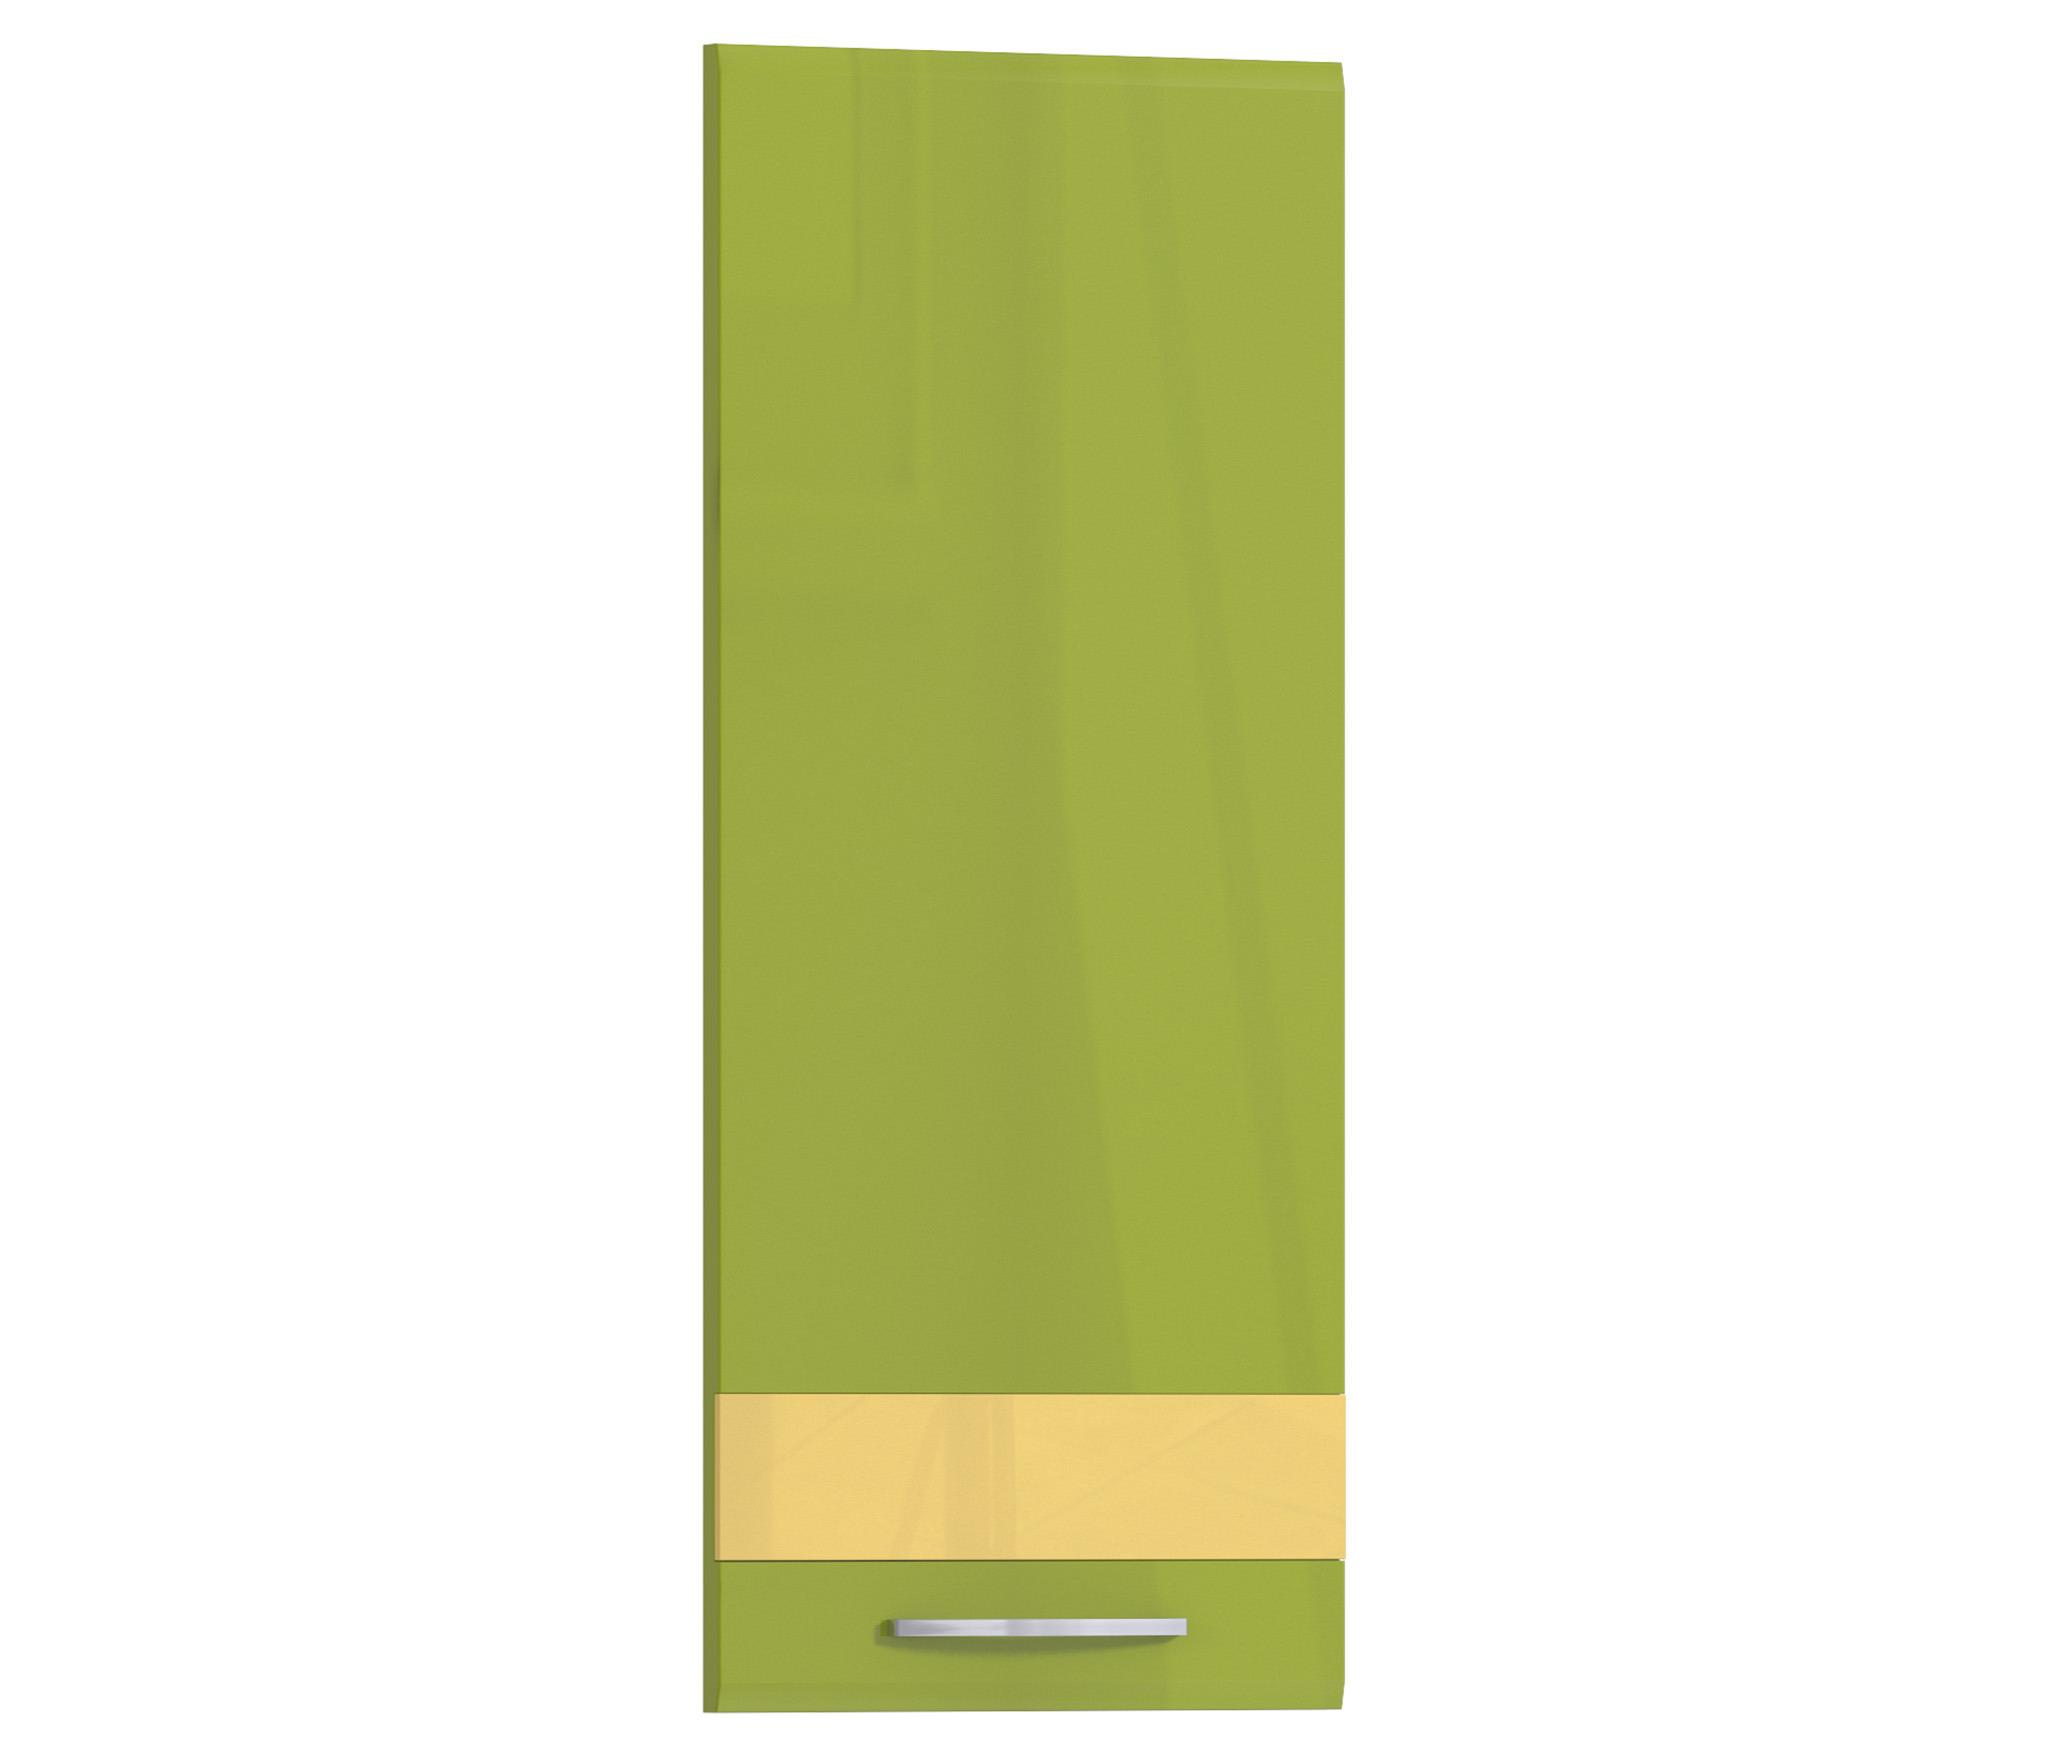 Фасад Регина Ф-140 к корпусу РП-180, РП-140, РПУ-160Мебель для кухни<br>Стильная дверца для подвесного шкафа.<br><br>Длина мм: 396<br>Высота мм: 920<br>Глубина мм: 22